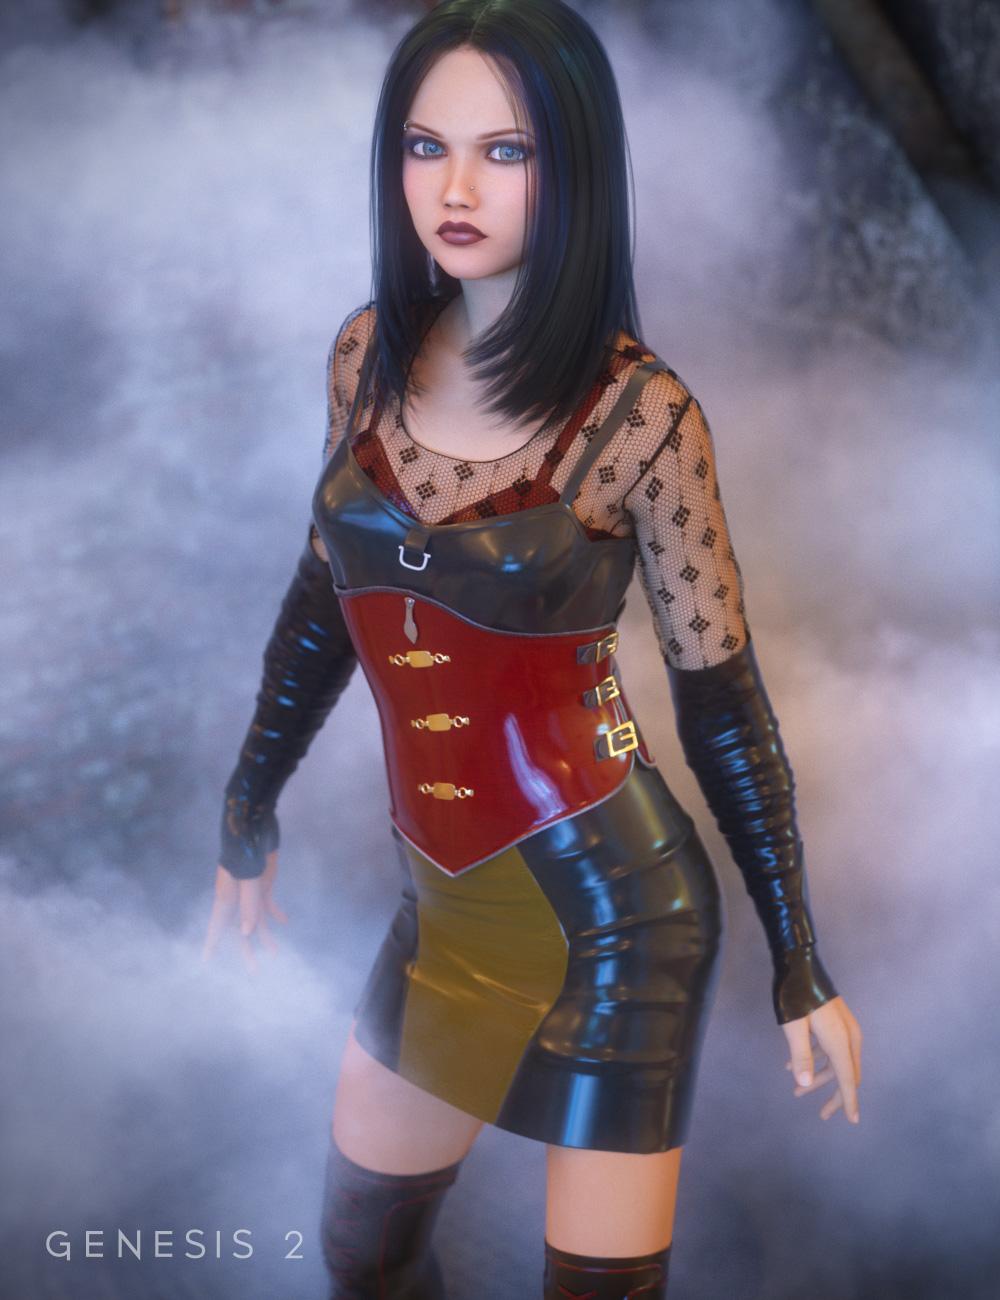 Emotions for Teen Josie by: Ravenhair, 3D Models by Daz 3D